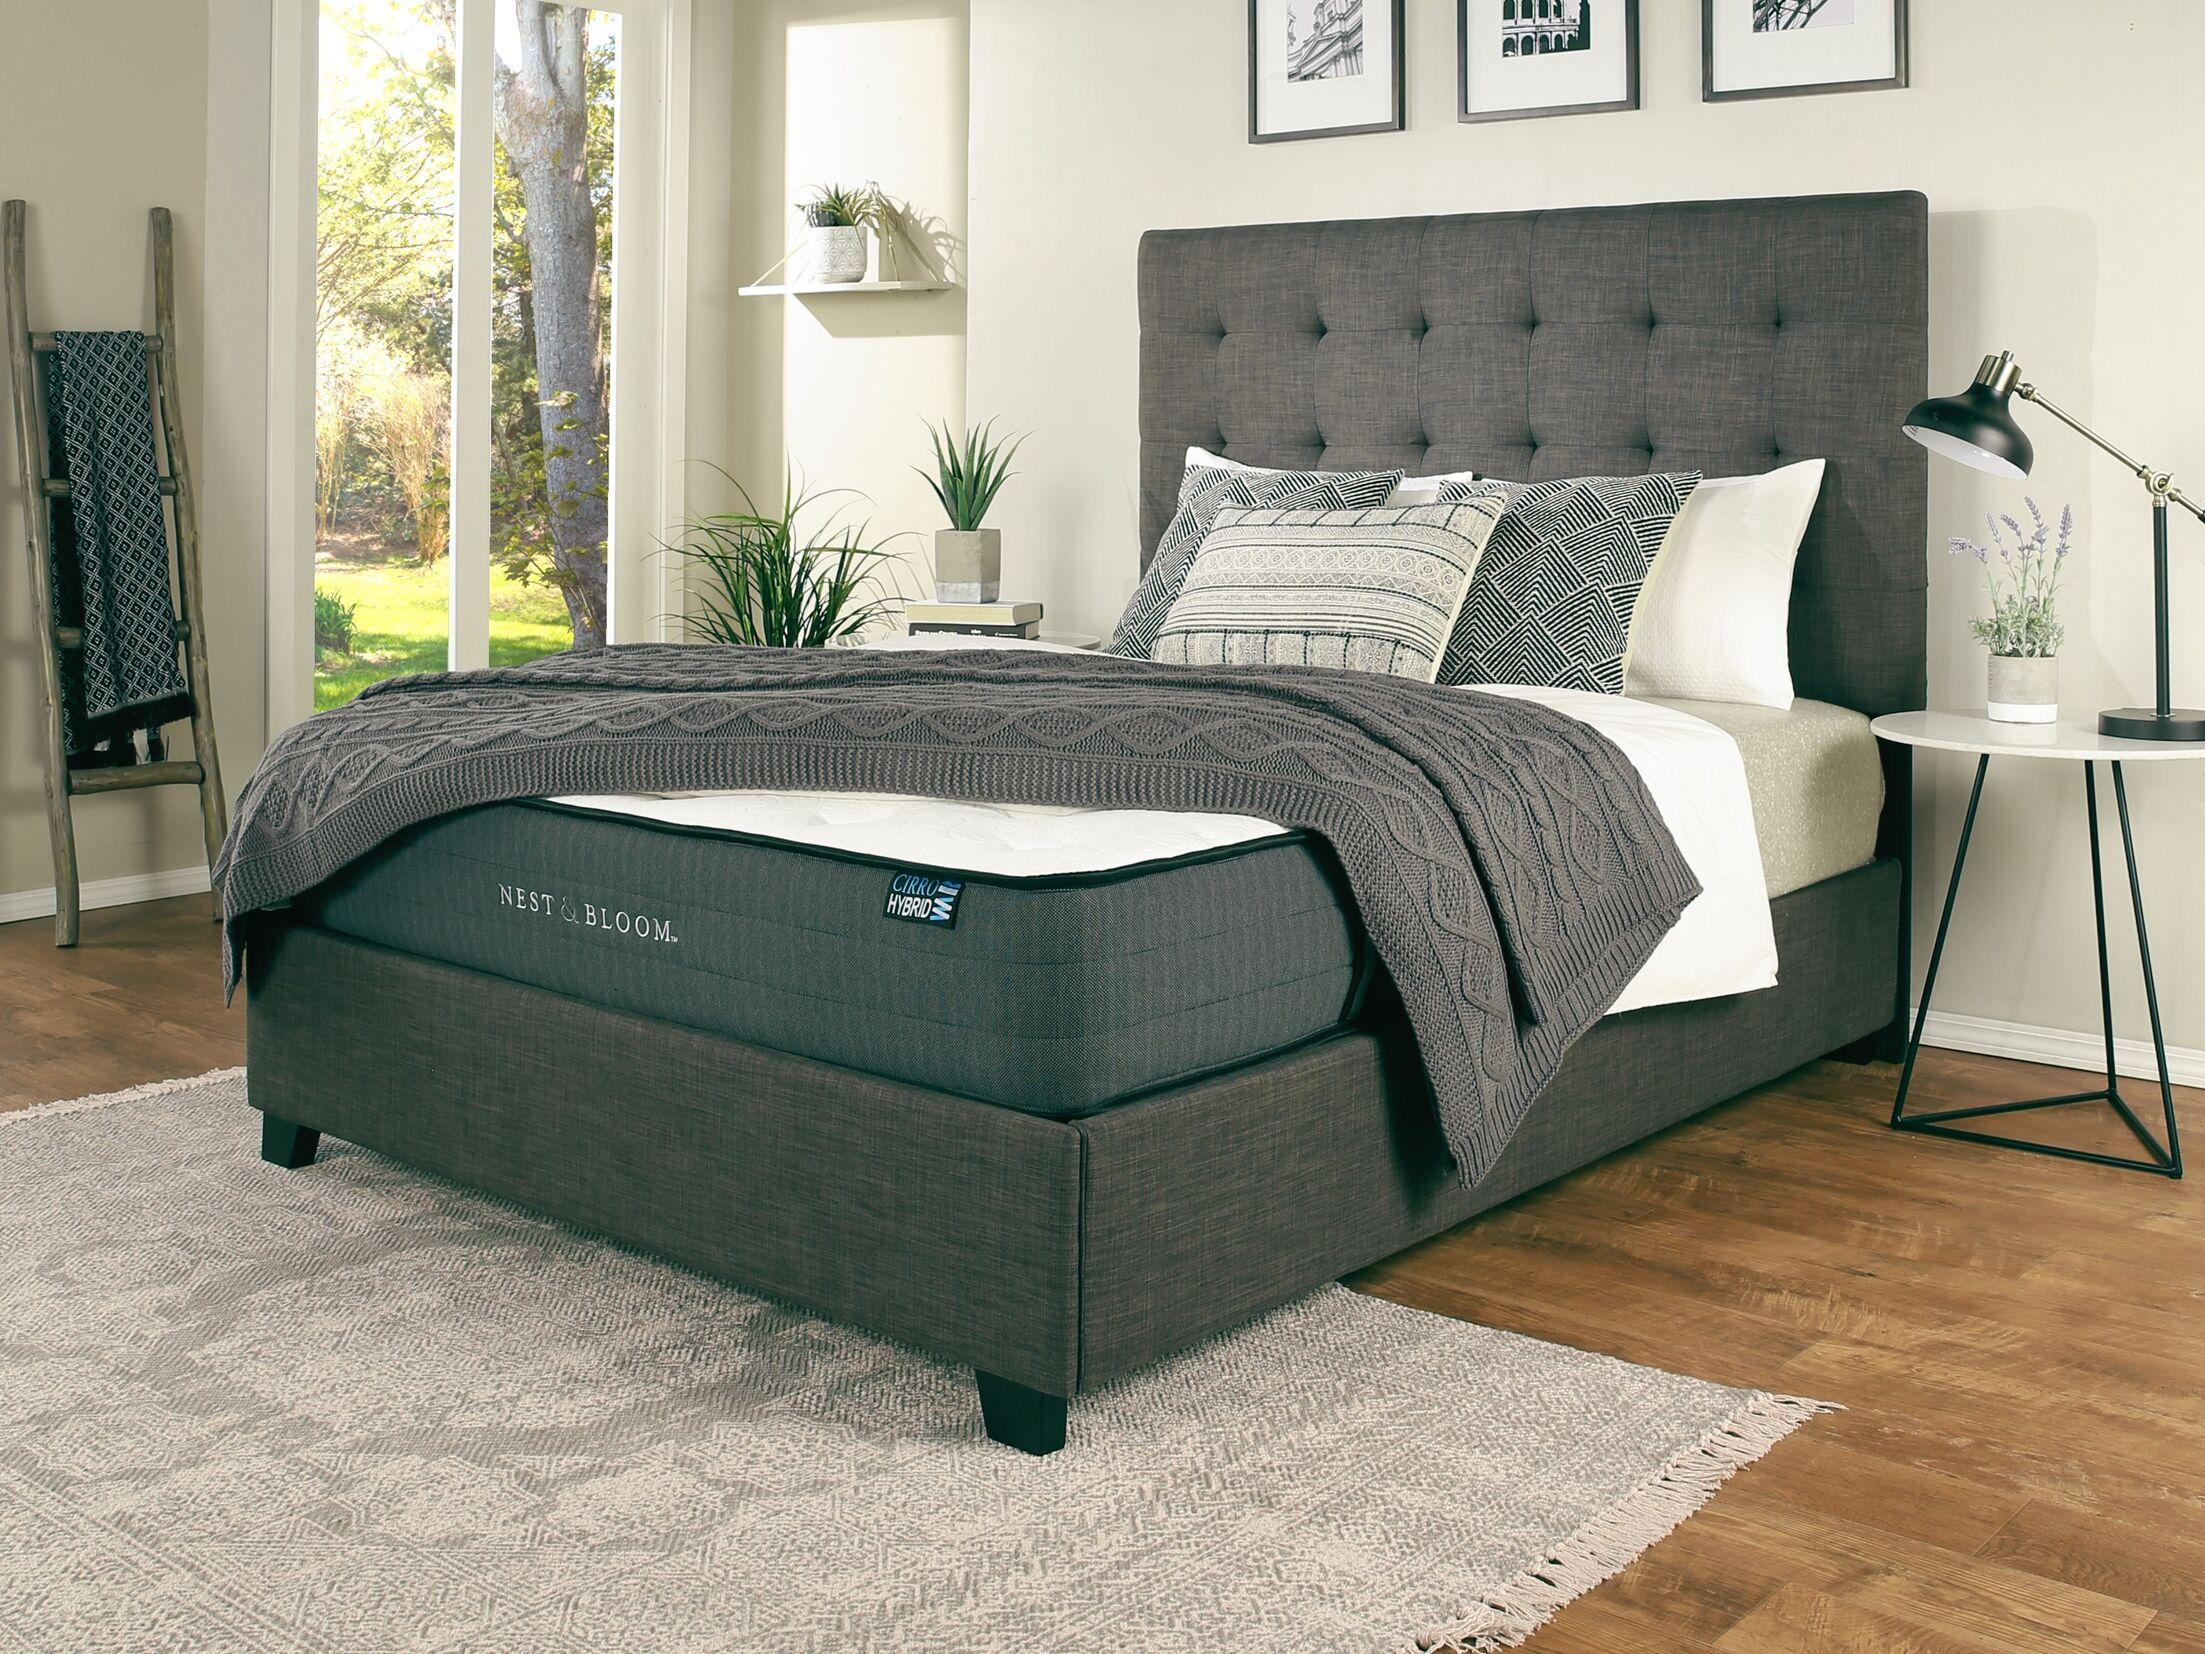 Almendarez Upholstered Platform Bed with Mattress Size: California King, Color: Gray